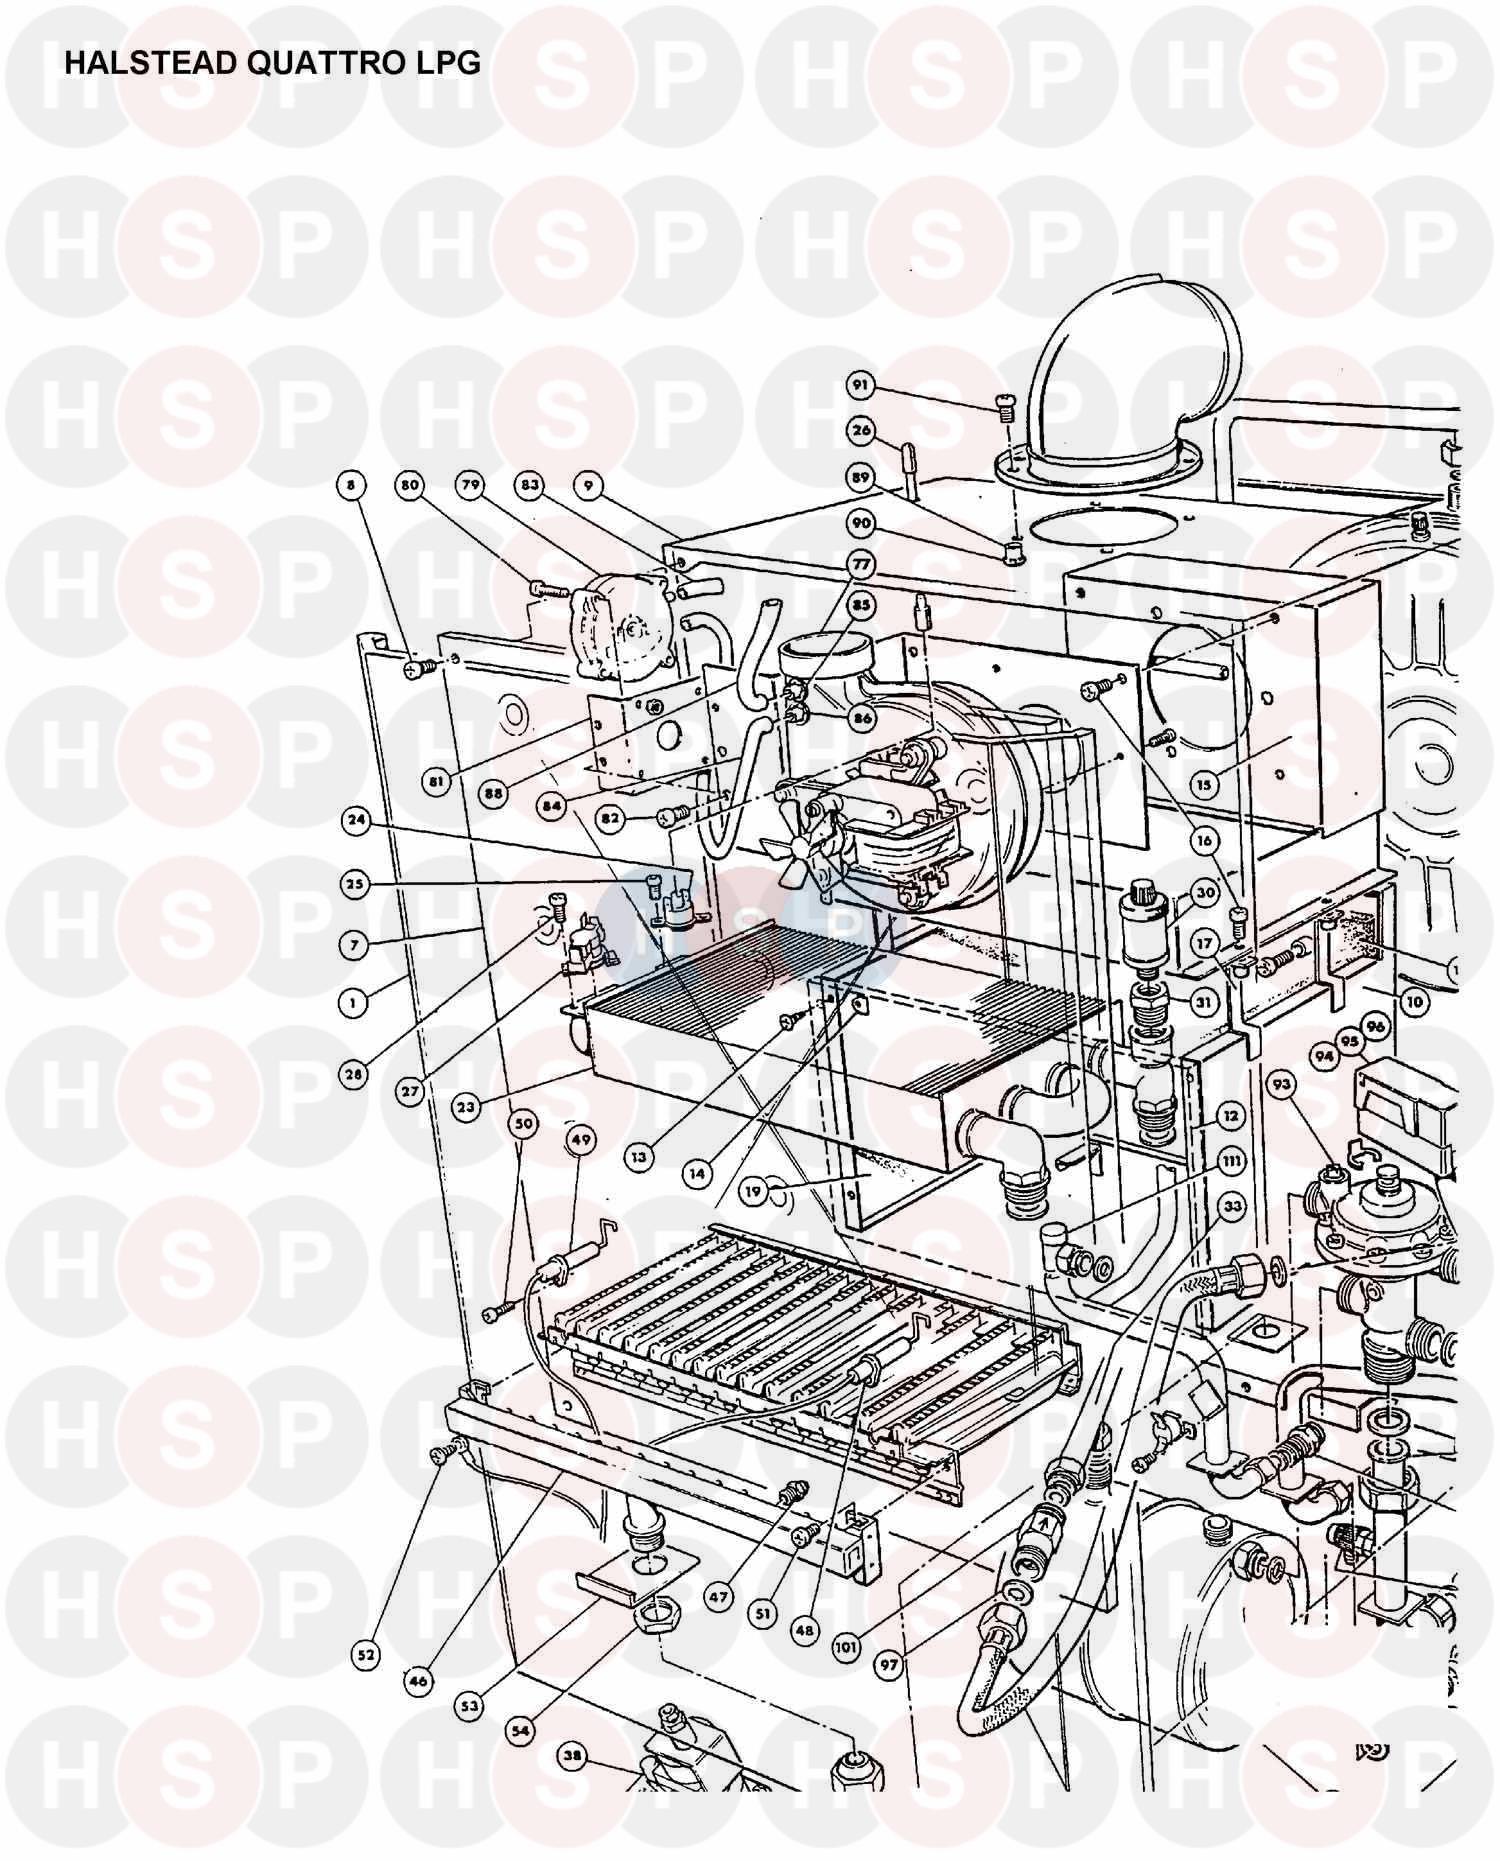 BOILER ASSEMBLY 3 diagram for Halstead QUATTRO LPG